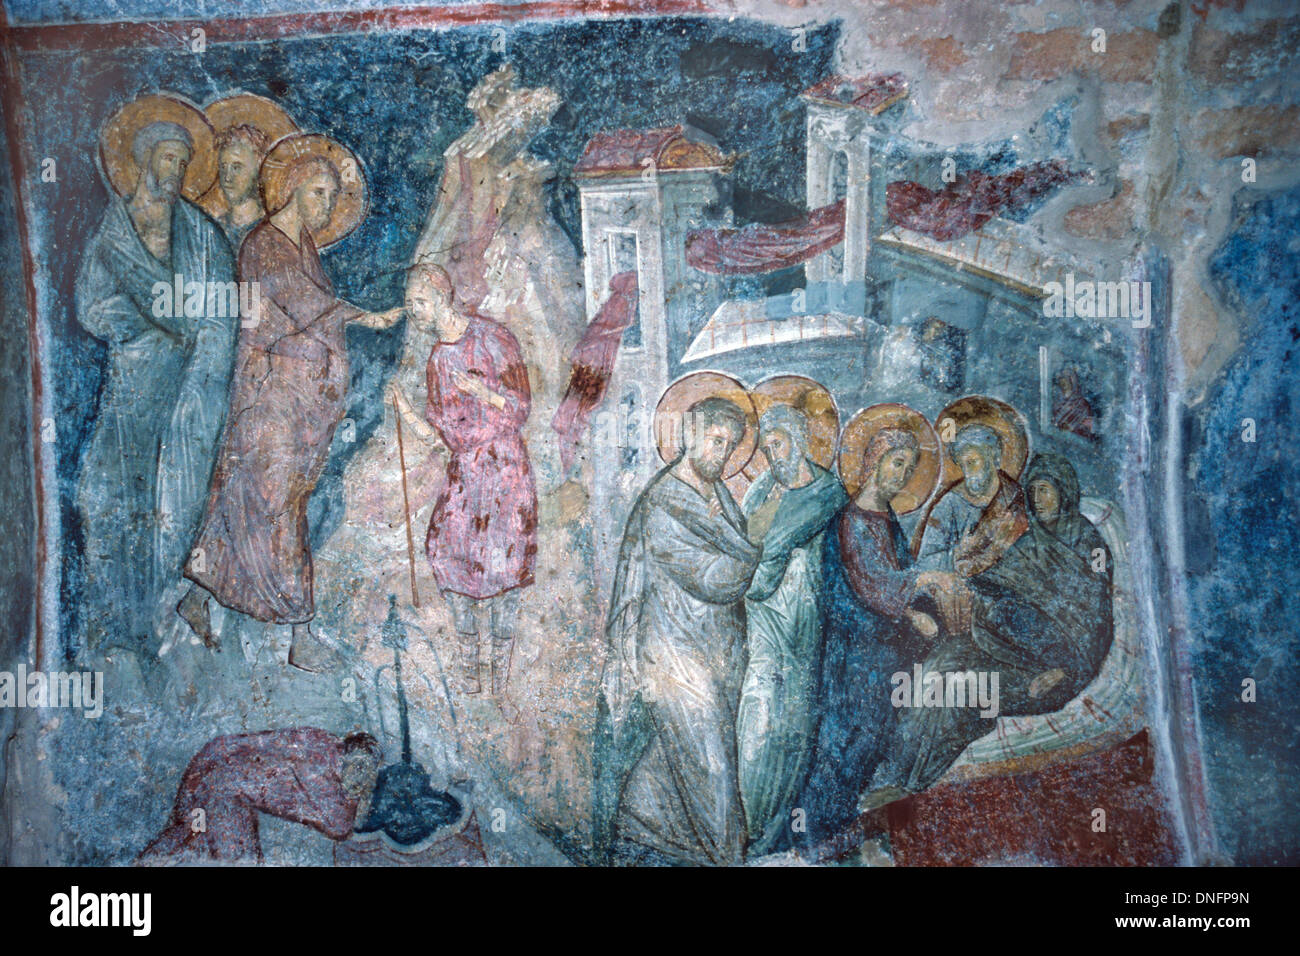 Miracle Jesus Christ Healing Blind Man Parable Byzantine Fresco (c14th) Hodegetria Church Brontochion Monastery Mistra Greece - Stock Image